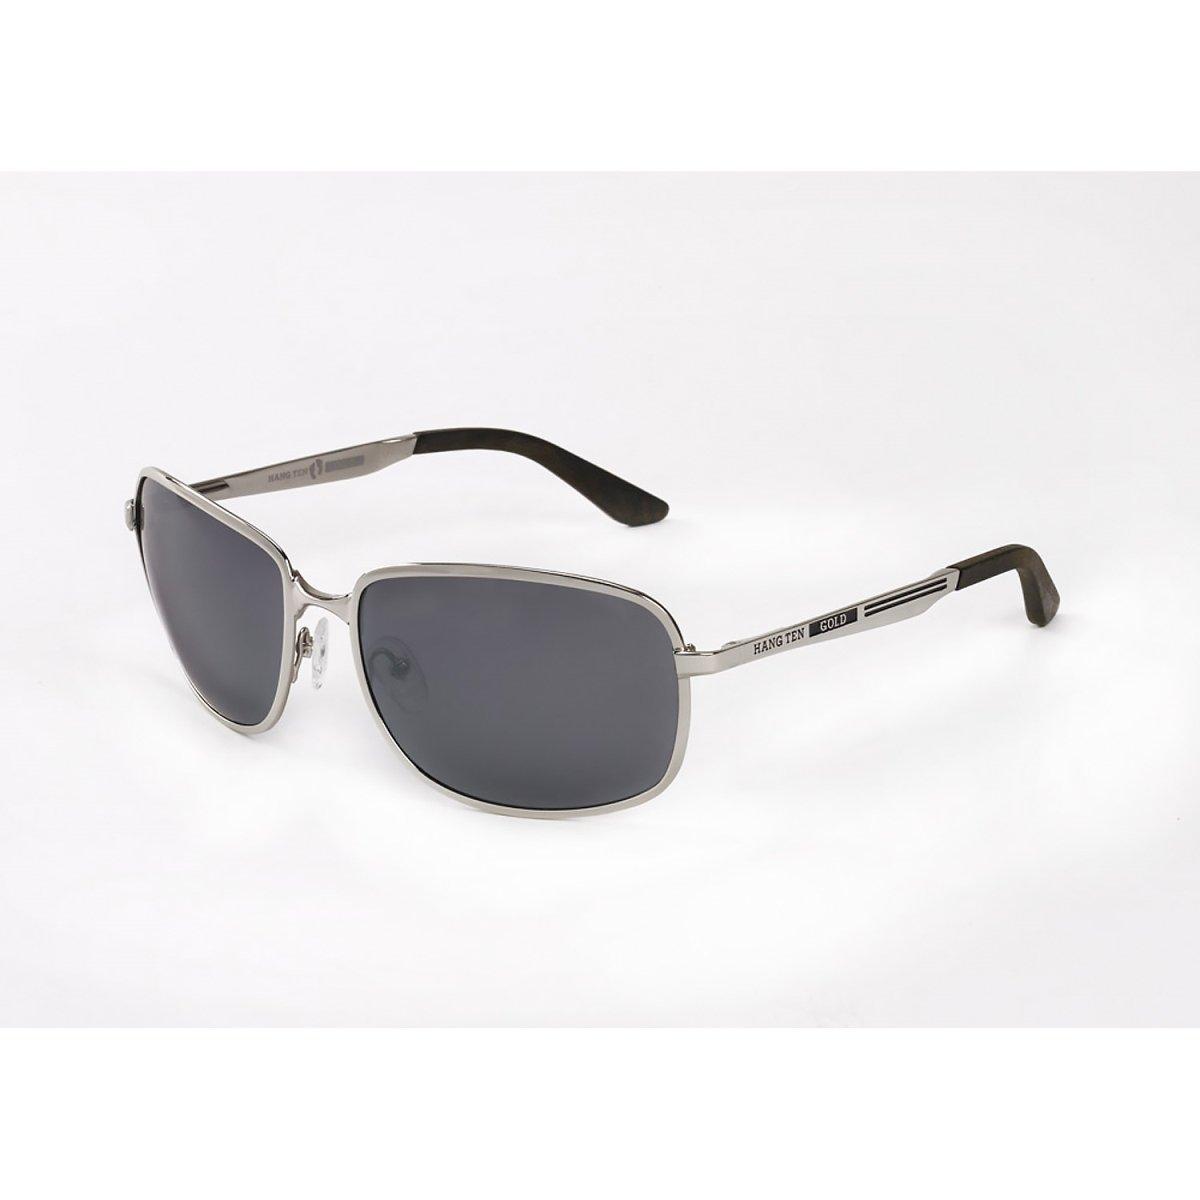 Hang Ten Gold Airstreamer-Shiny Silver/Smoke Lens